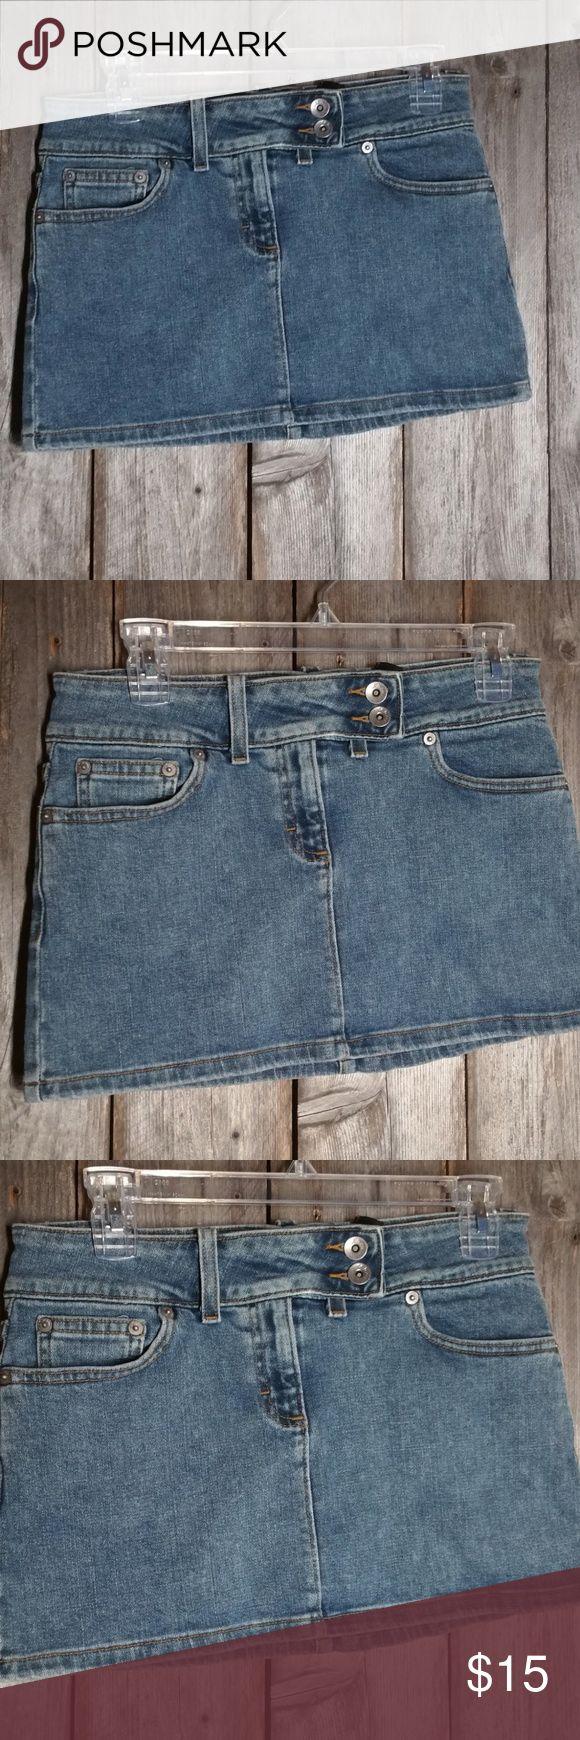 Calvin Klein Skirt Mini Blue Jean Denim Calvin Klein Blue Jean Denim Junior Skirt Mini Short Pencil Straight size 7  Cotton & spandex Mini skirt Approx waist 29, length 12 Gently used Light to medium wash Calvin Klein Skirts Mini